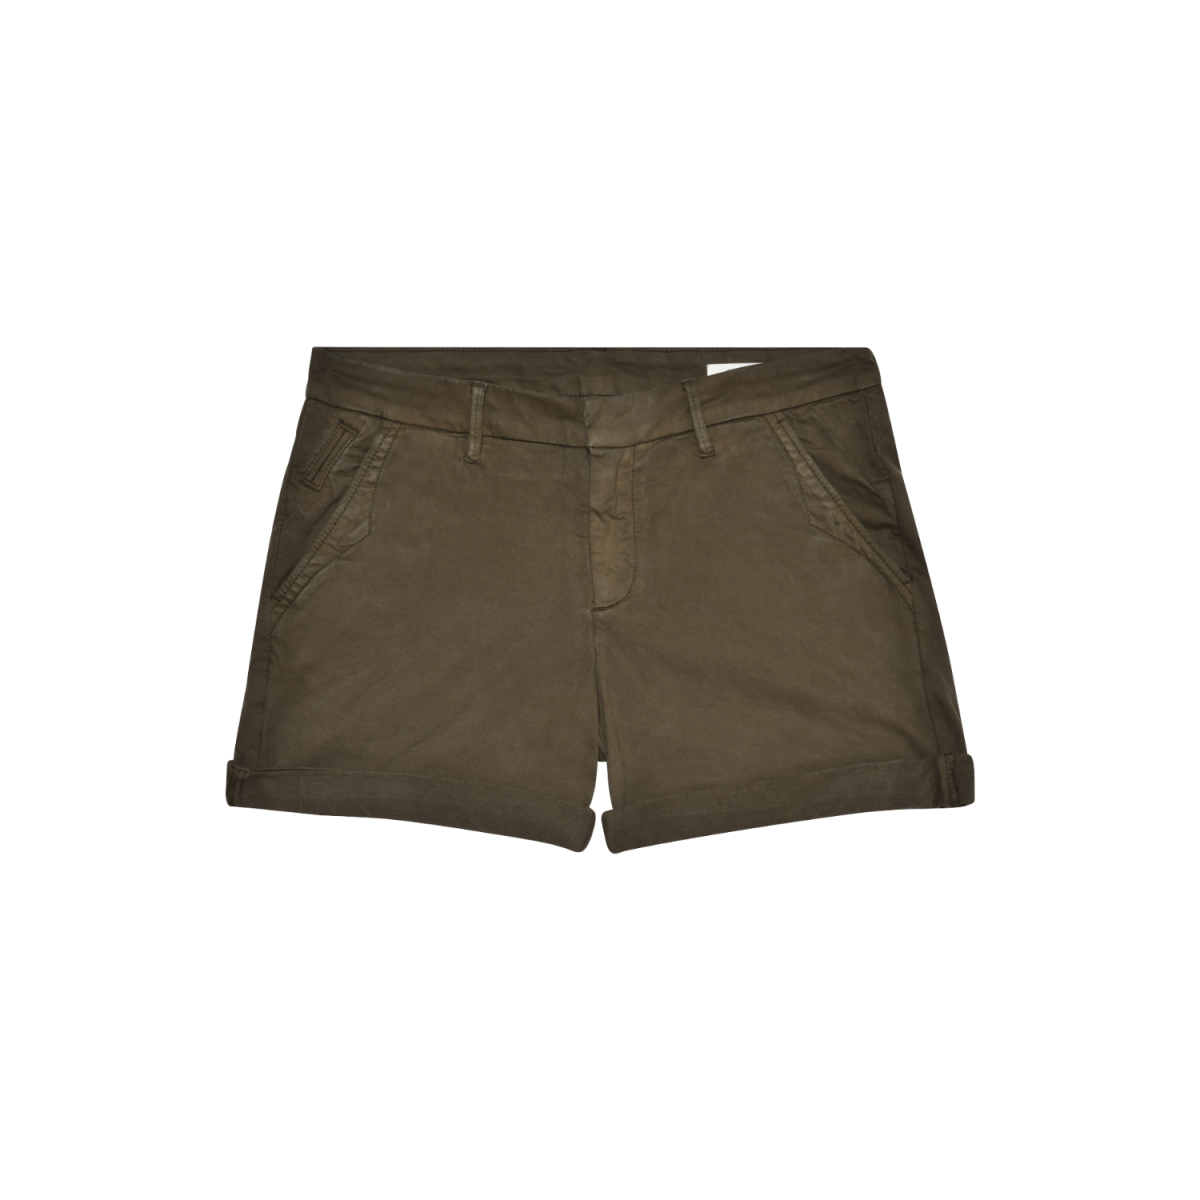 selena shorts - dark kaki